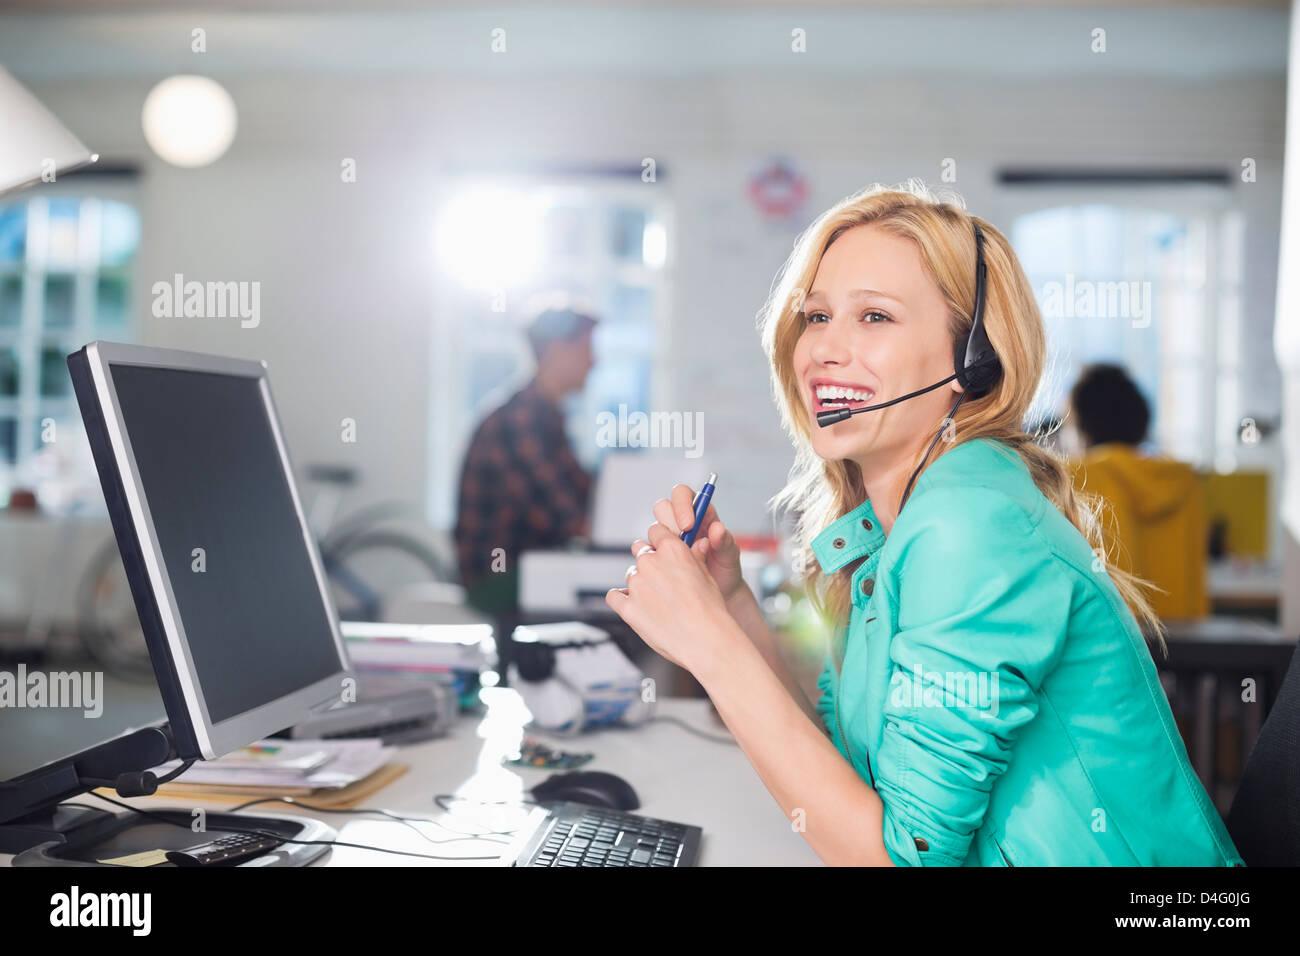 Businesswoman talking on headset at desk - Stock Image